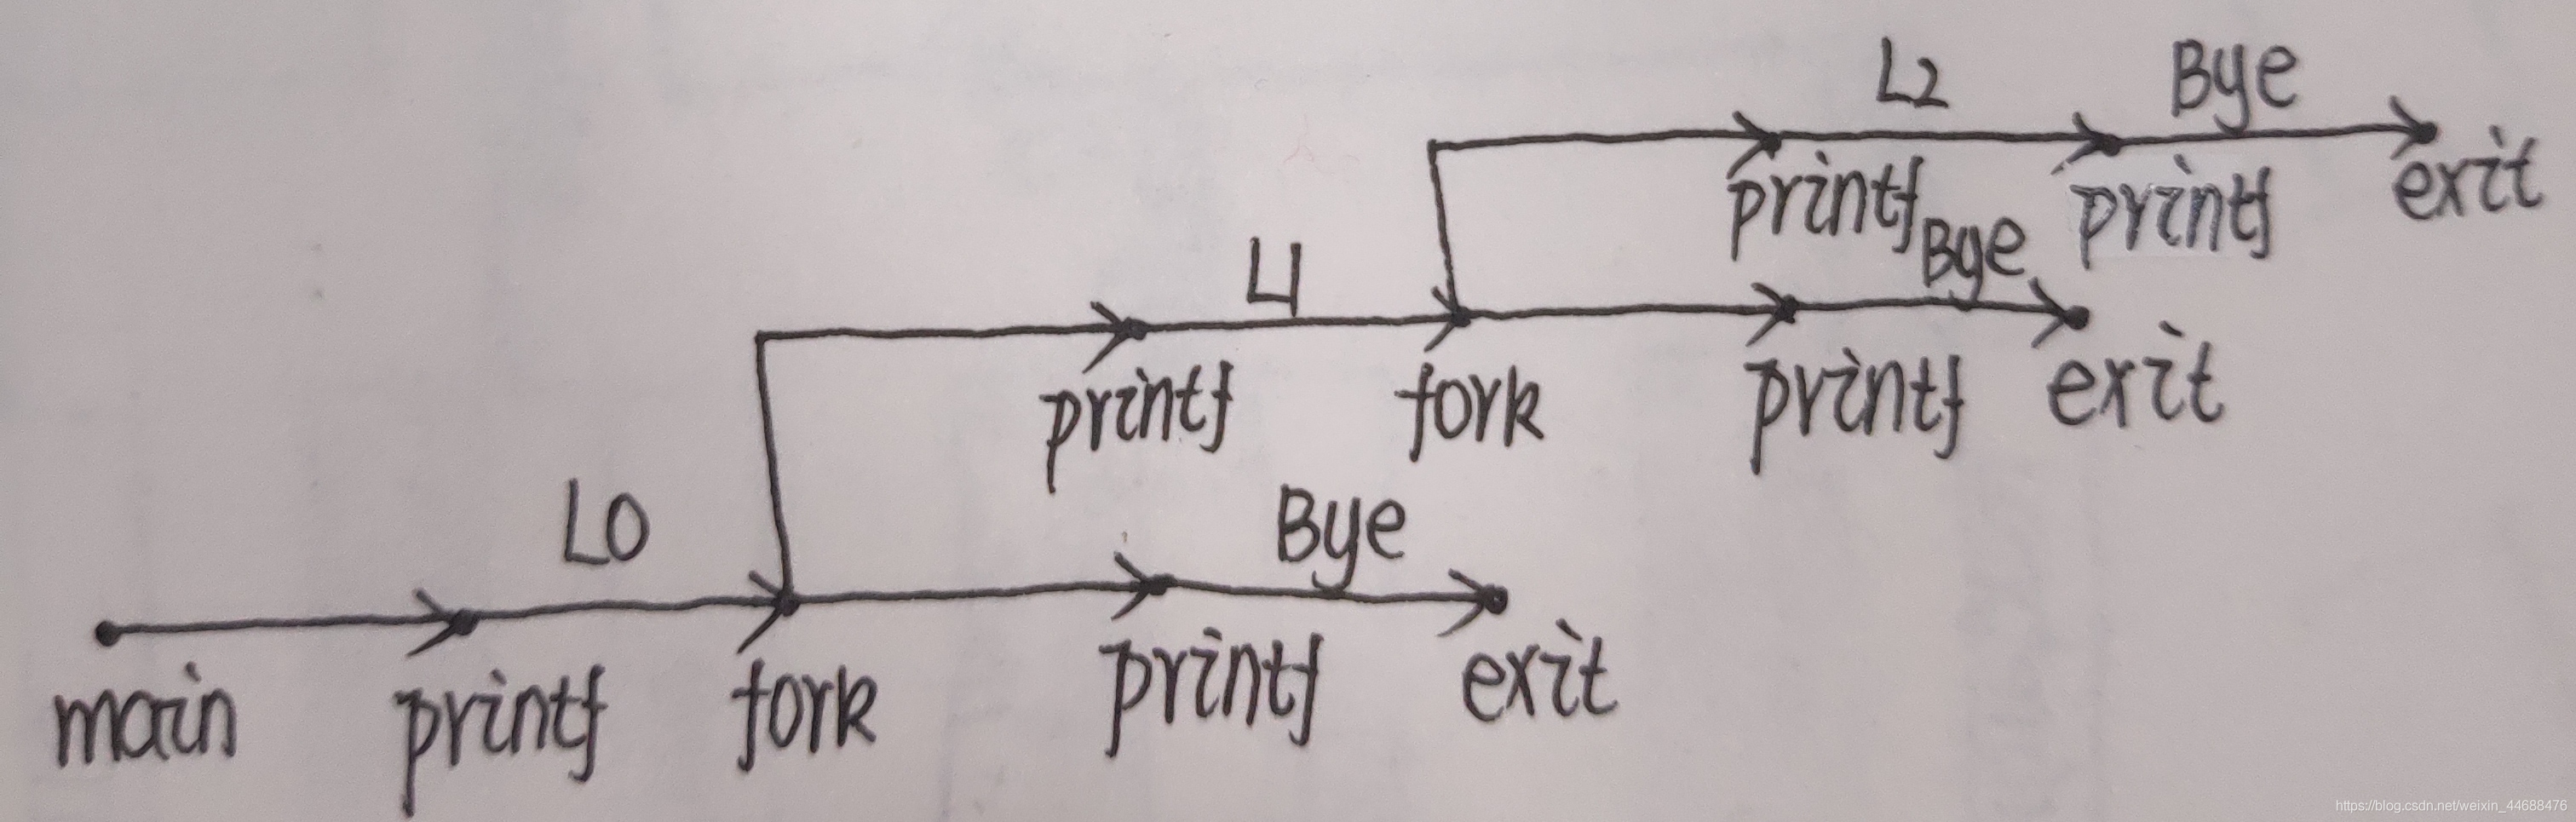 Fork函数的解析(一)17